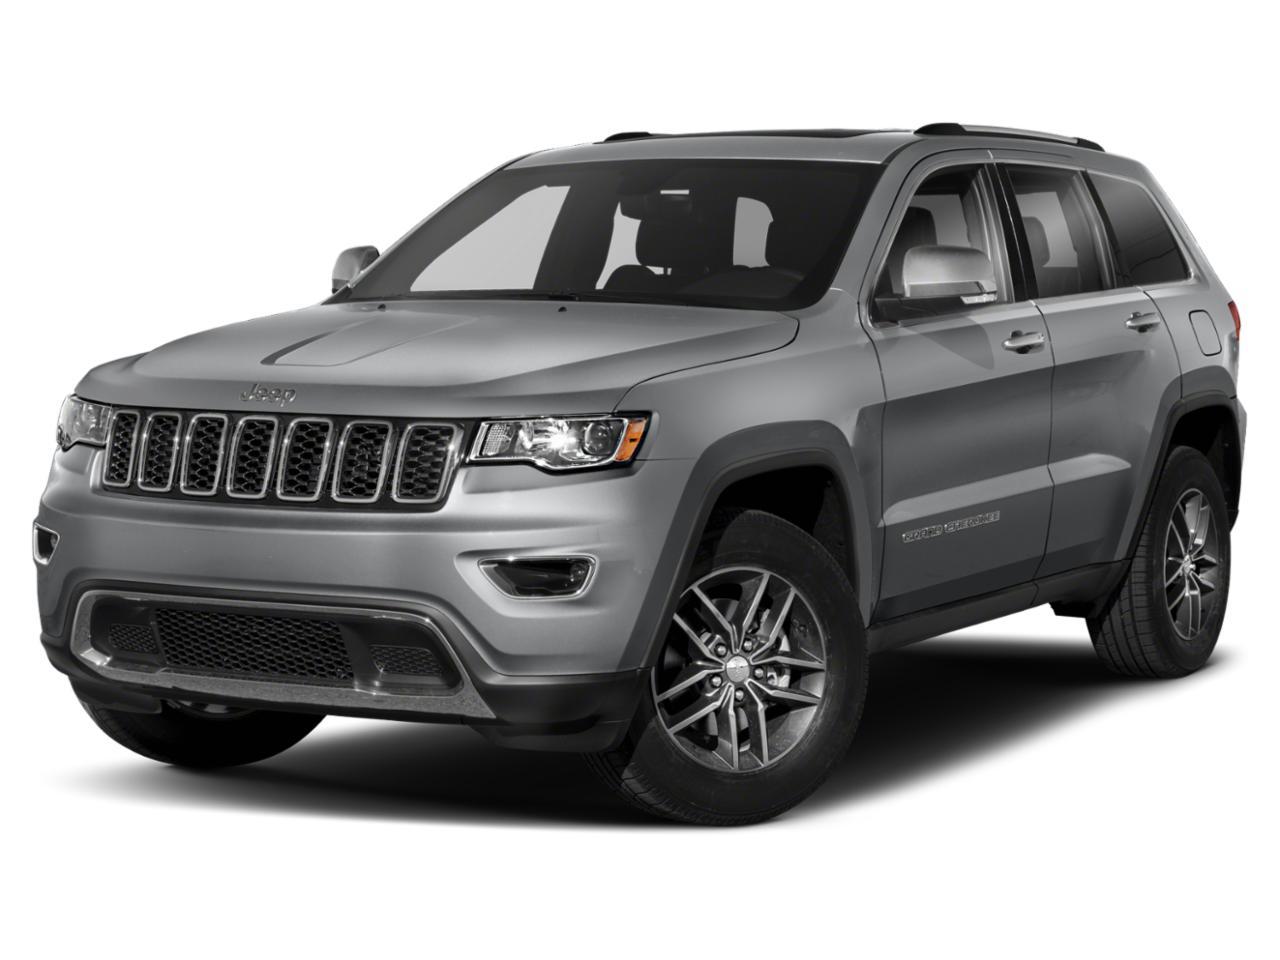 2019 Jeep Grand Cherokee Vehicle Photo in Nashua, NH 03060